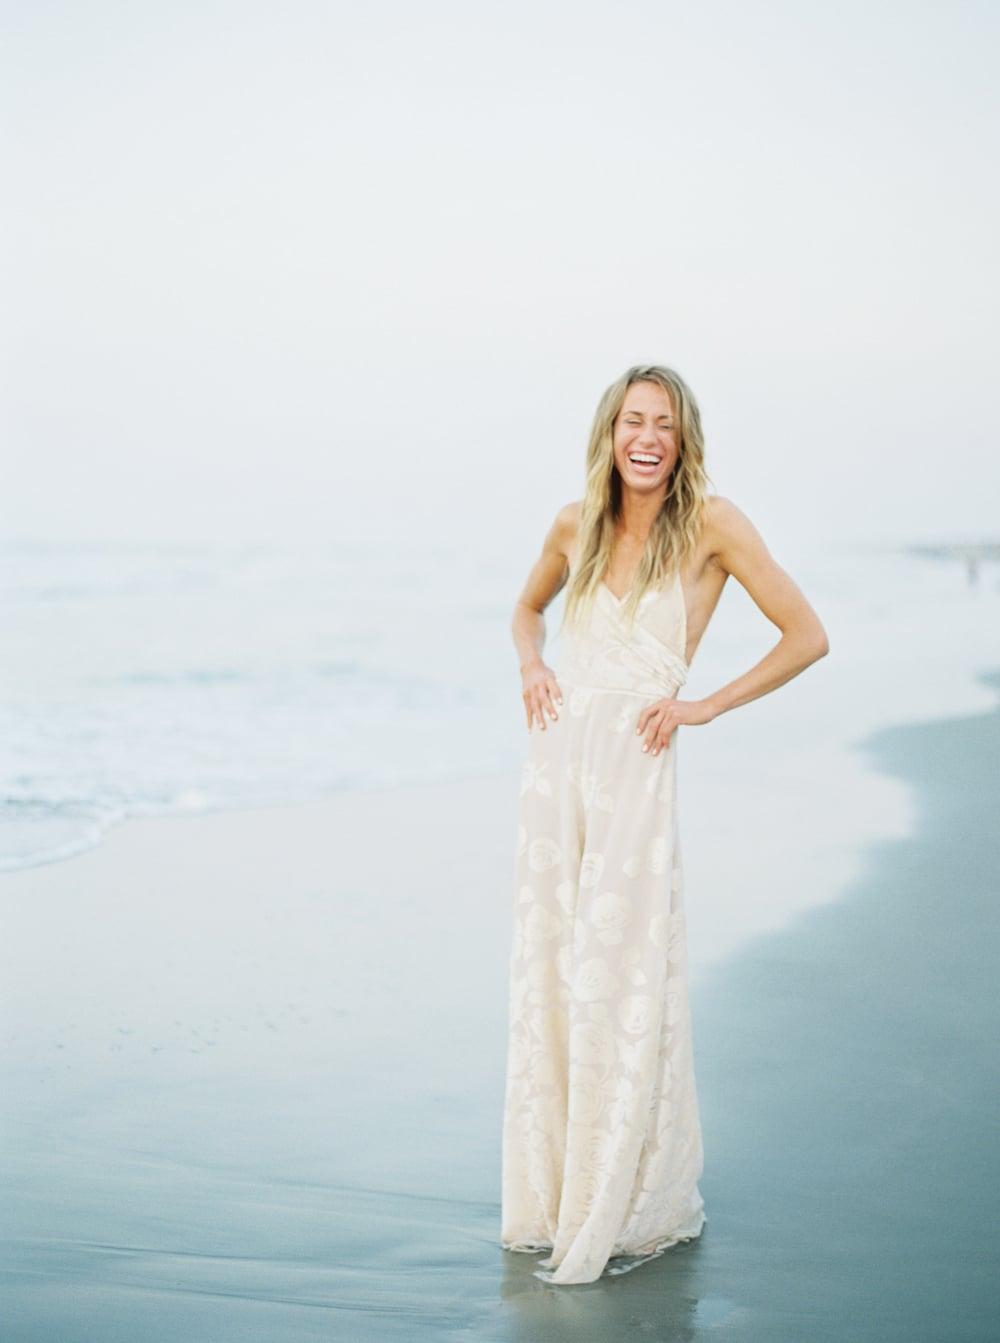 Best Lowcountry Bridal Styles of 2015 - Charleston, Savannah, Hilton Head and Myrtle Beach Weddings